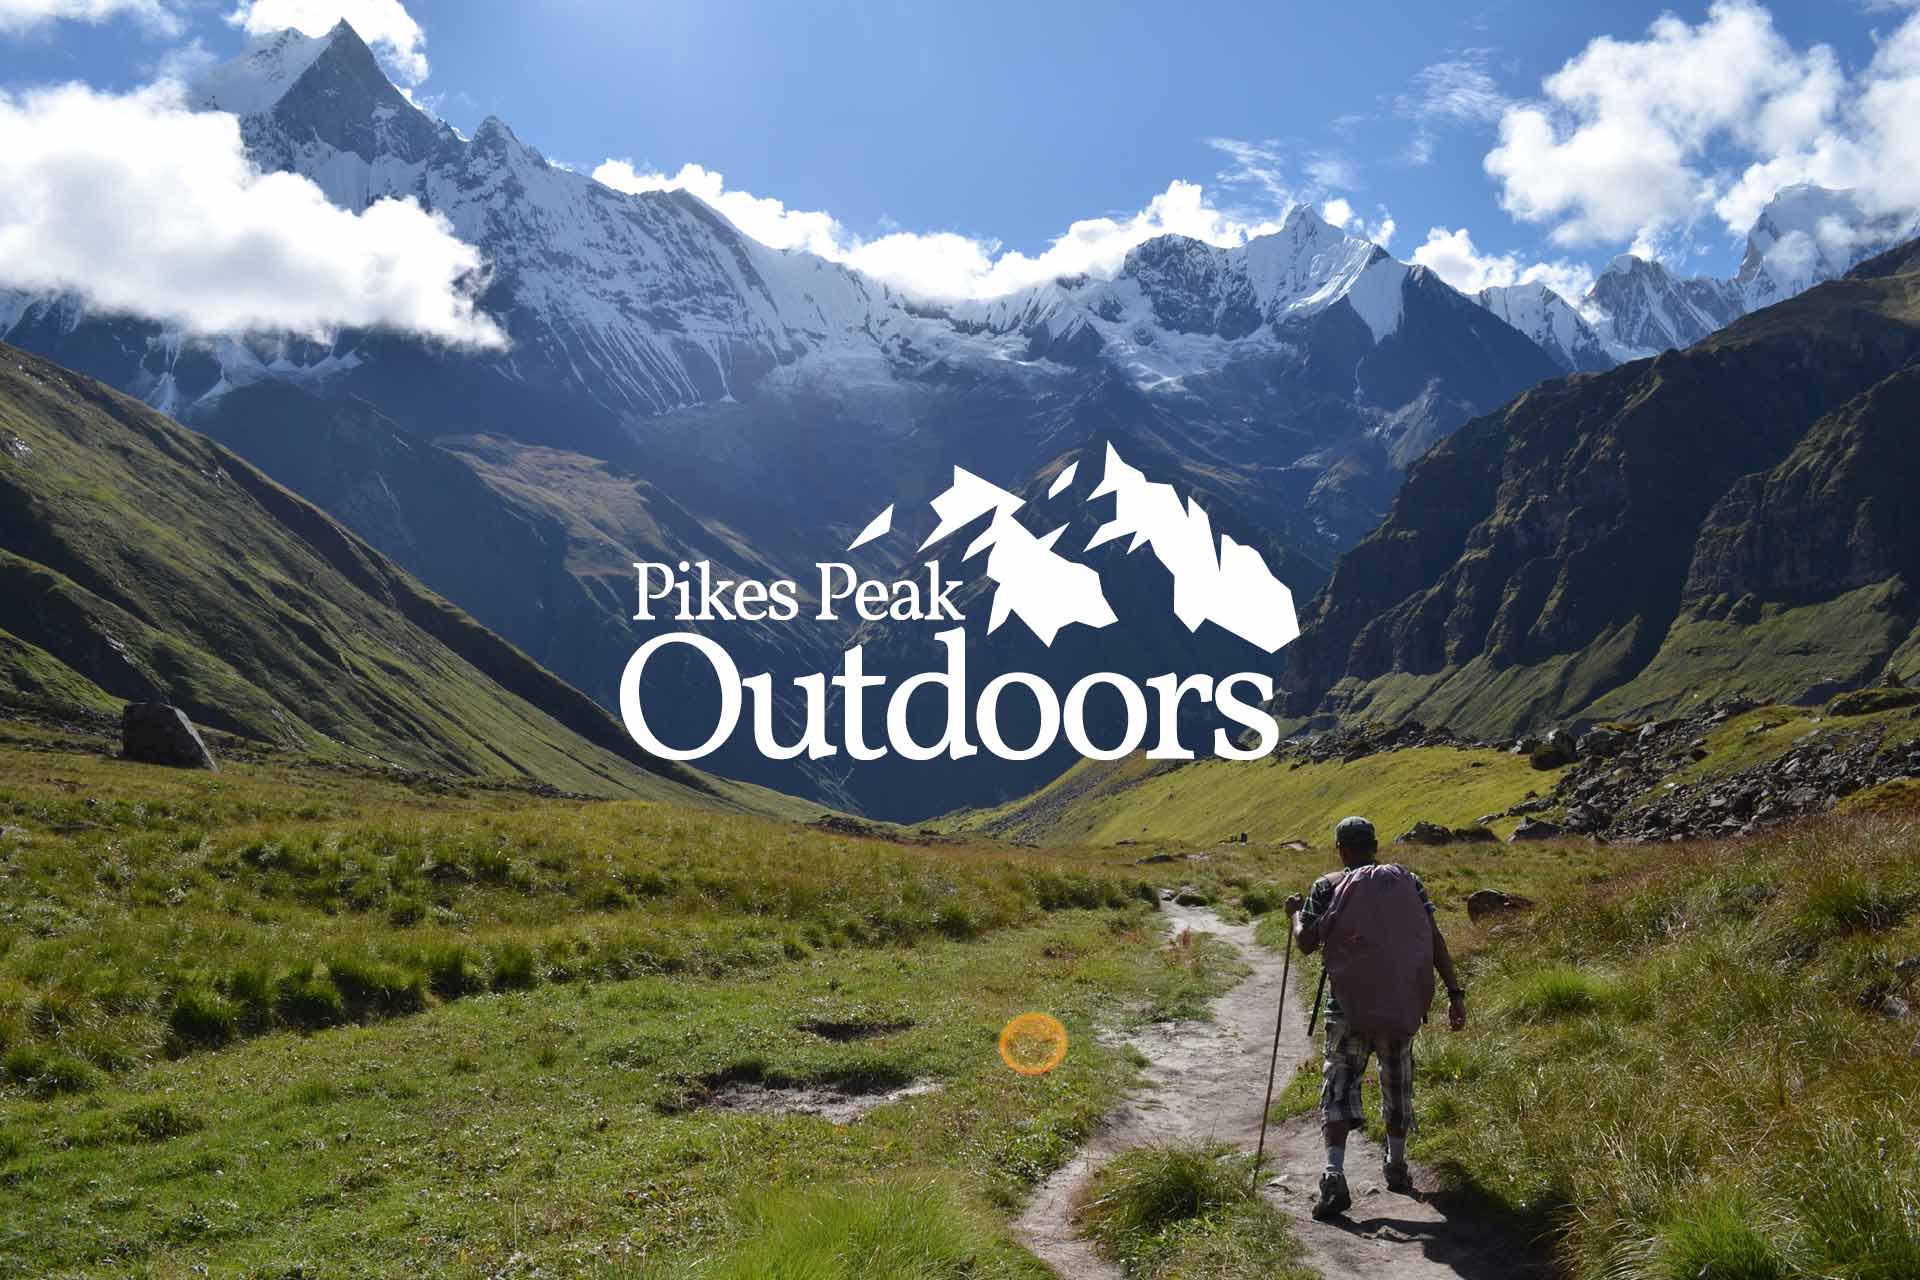 pikes peak outdoors brand identity website blakely